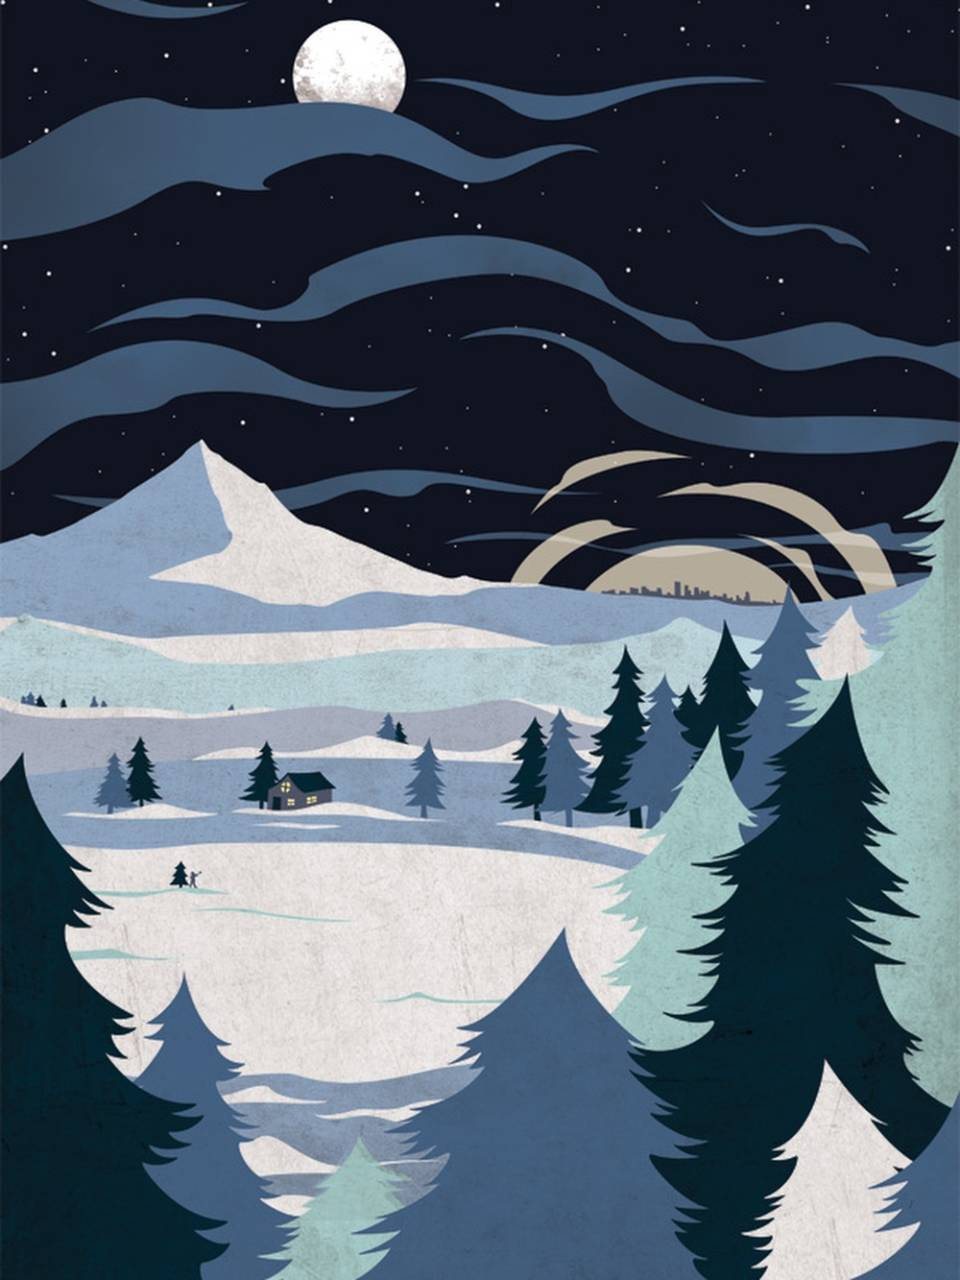 Постеры на зиму